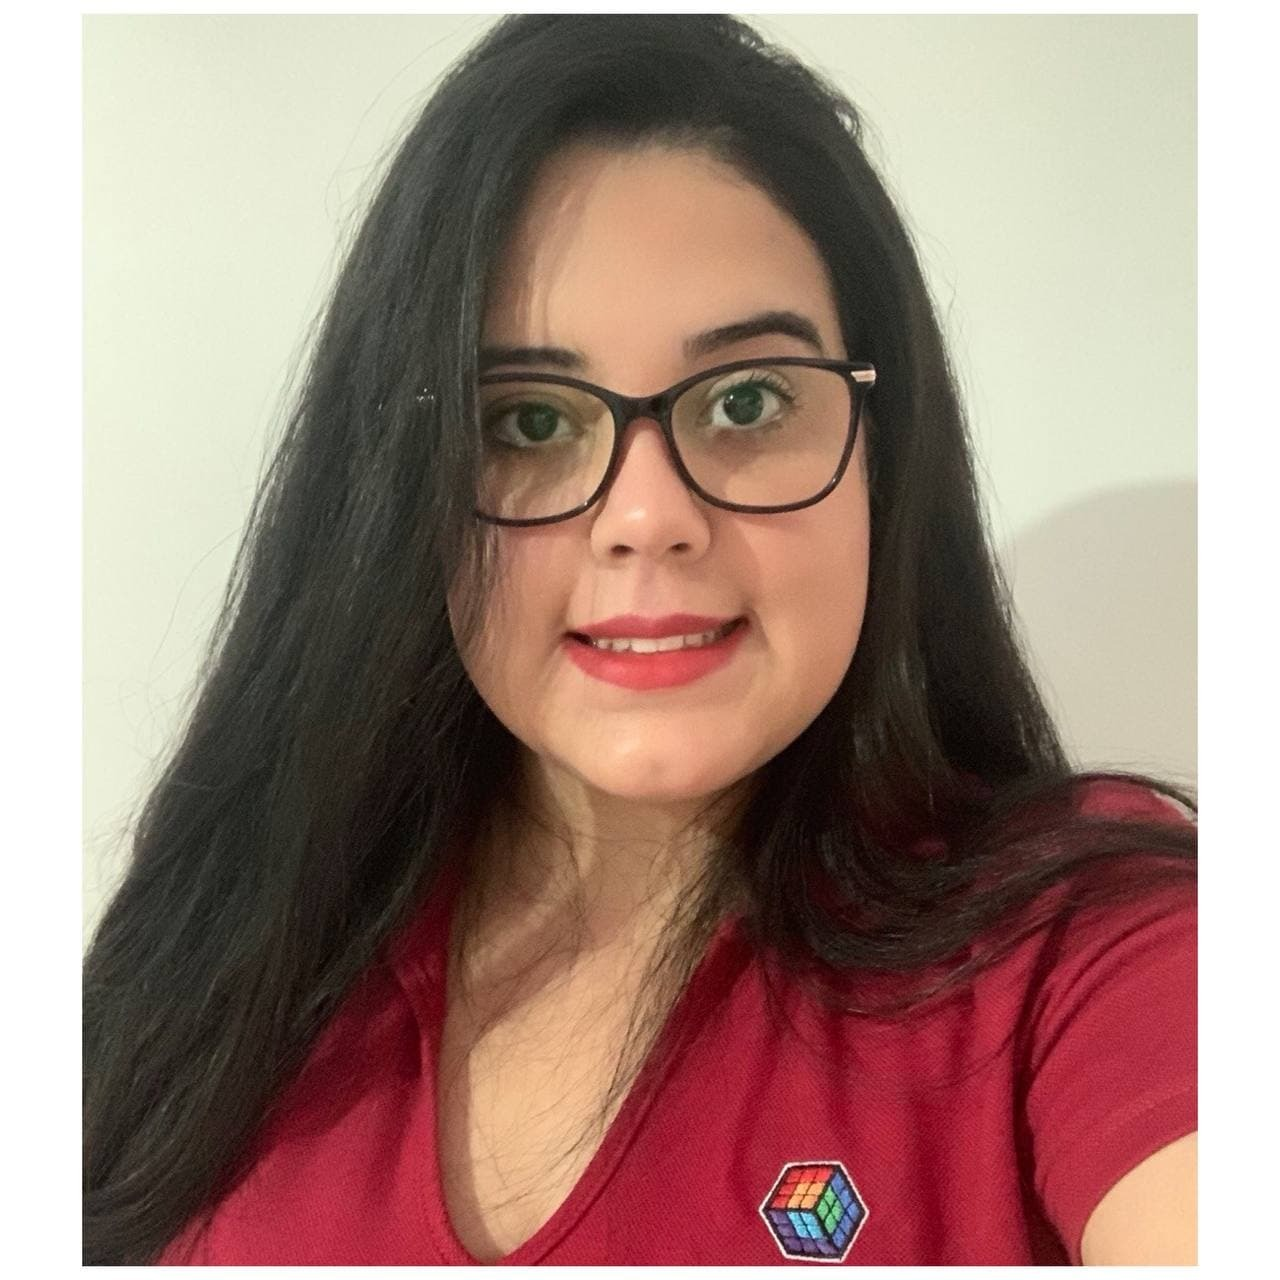 Natali Cabral